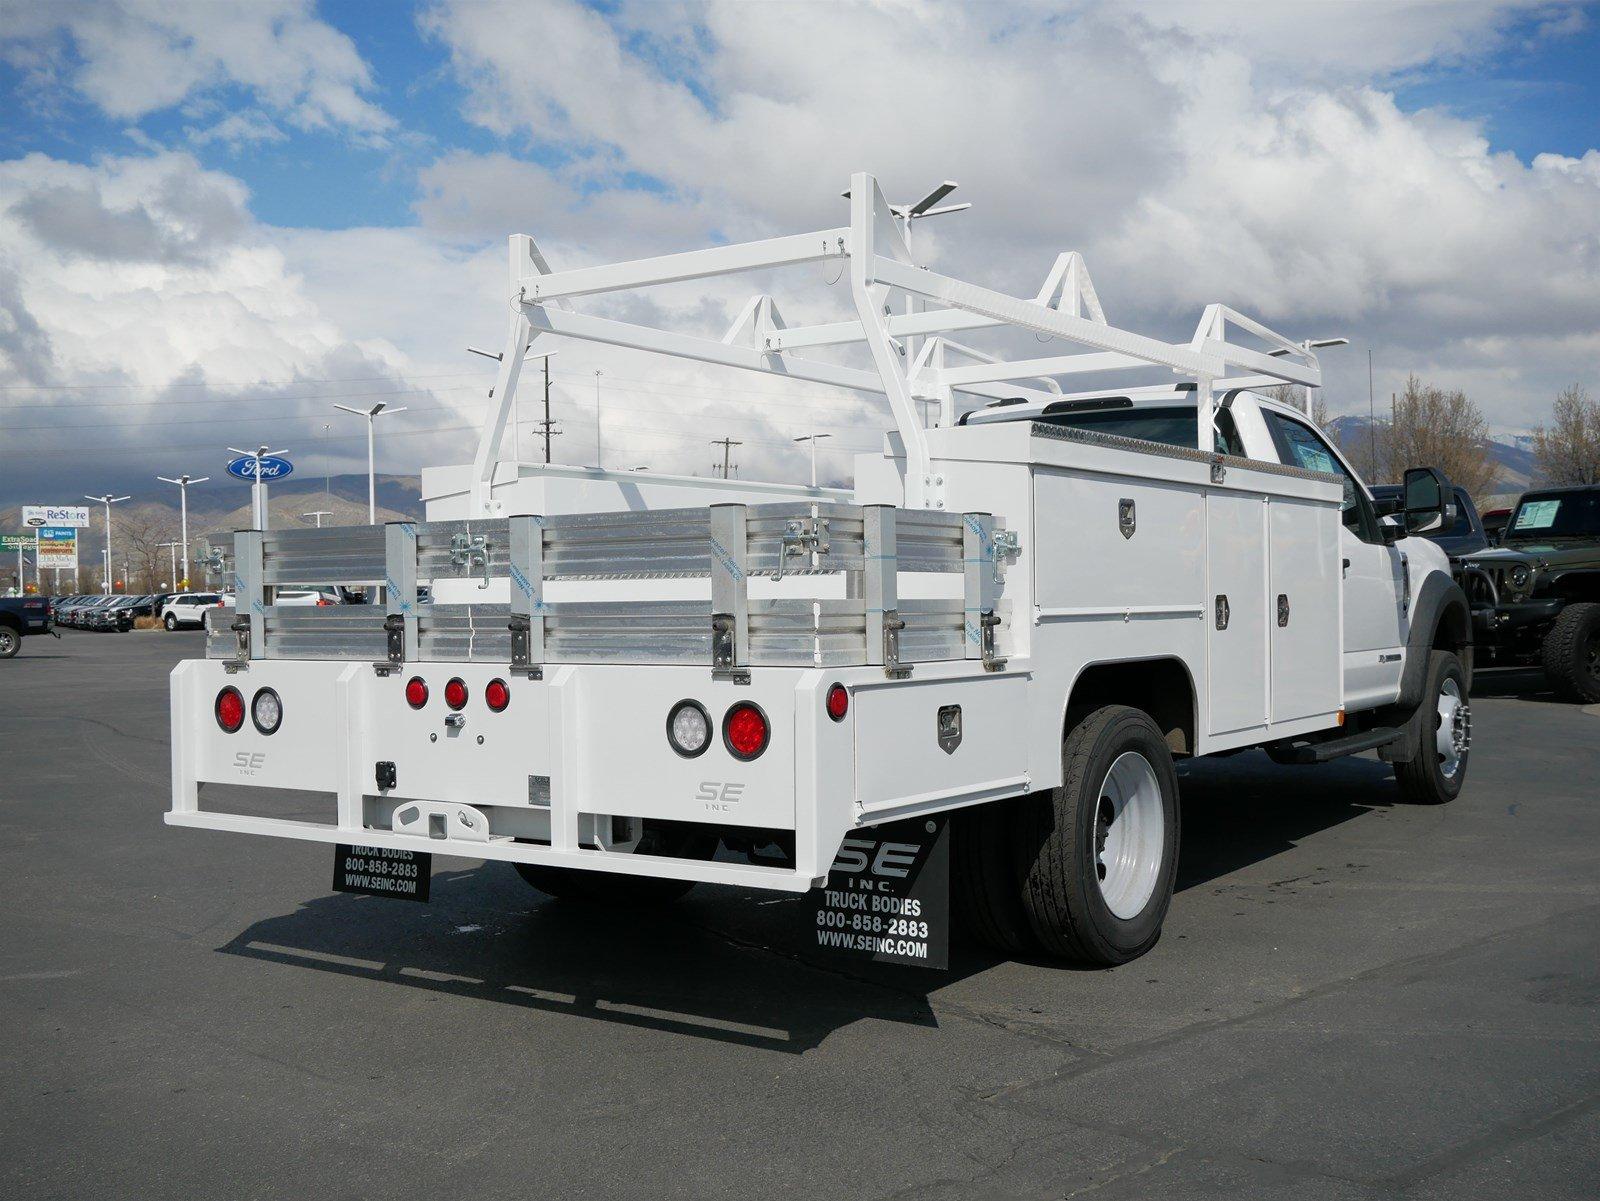 2020 F-550 Regular Cab DRW 4x4, Scelzi Combo Body #63081 - photo 1